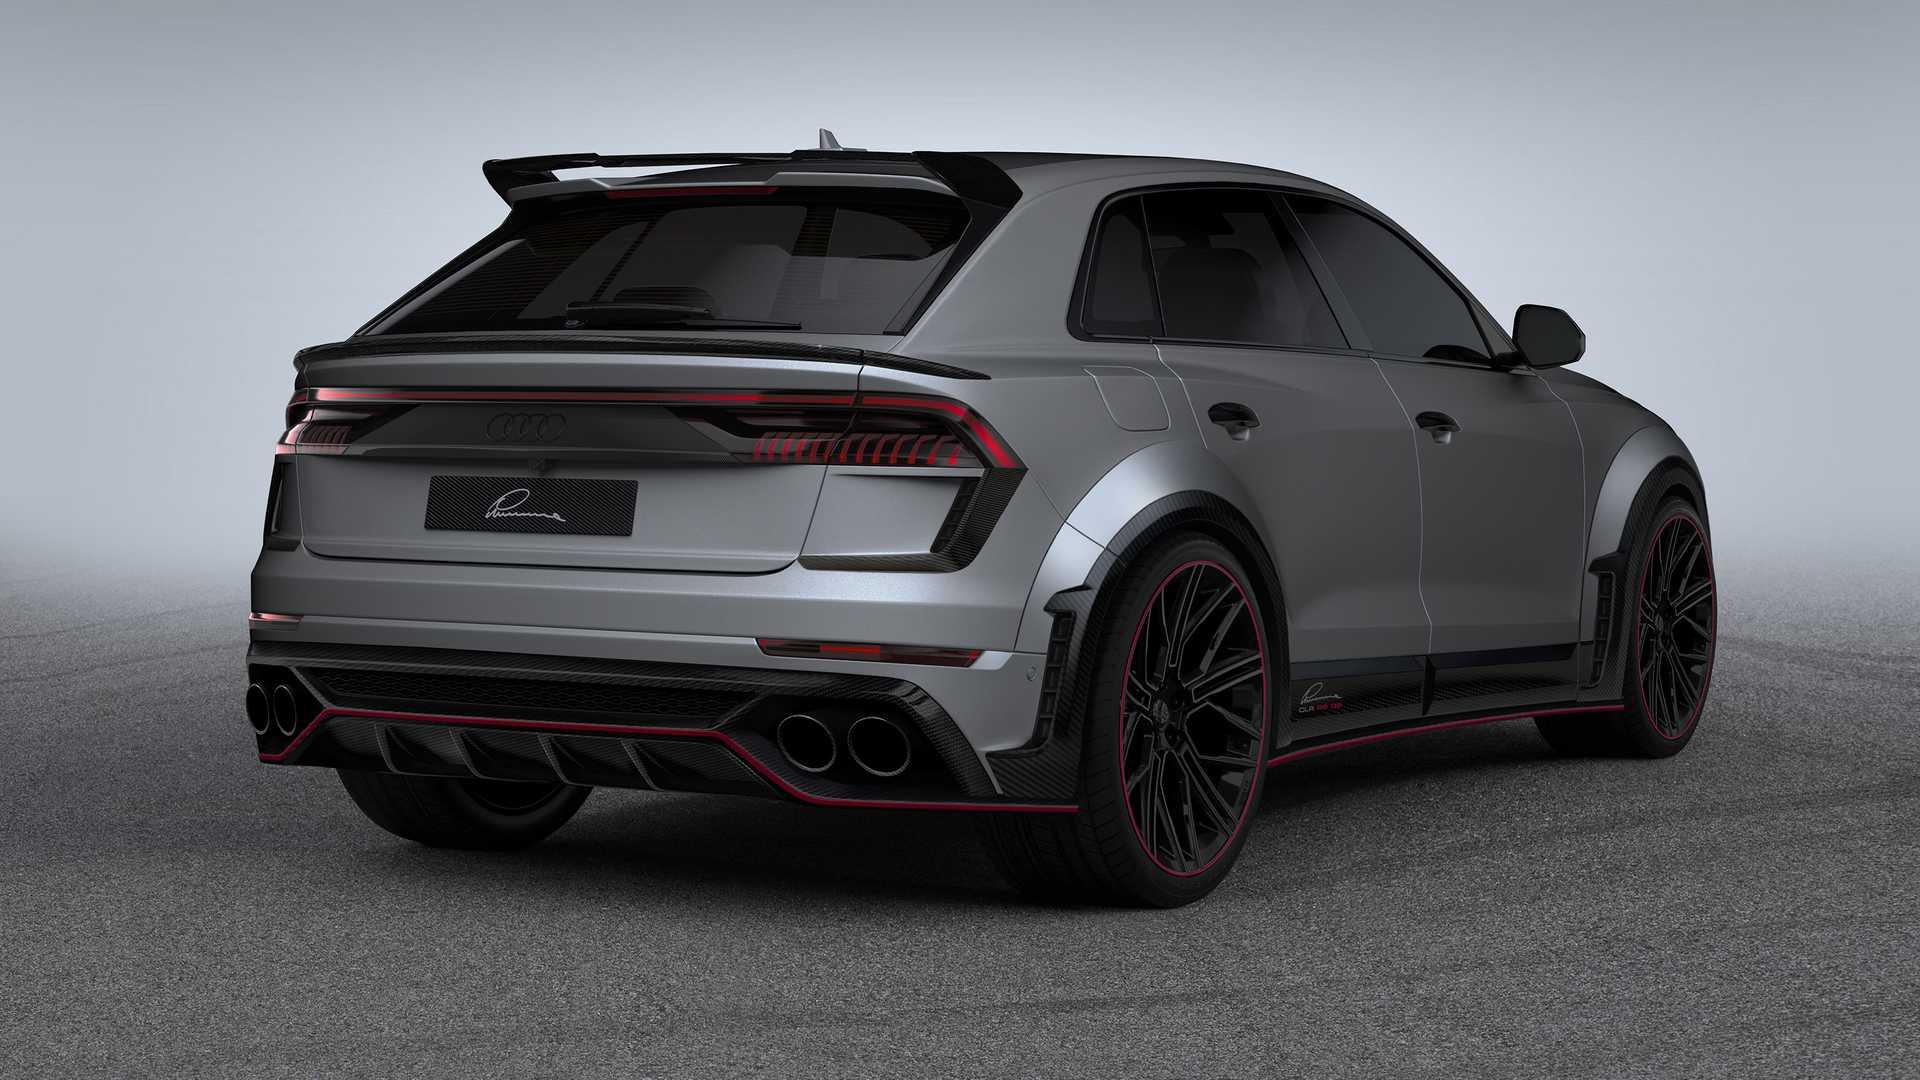 Audi-RS-Q8-CLR-8-RS-By-Lumma-Design-5